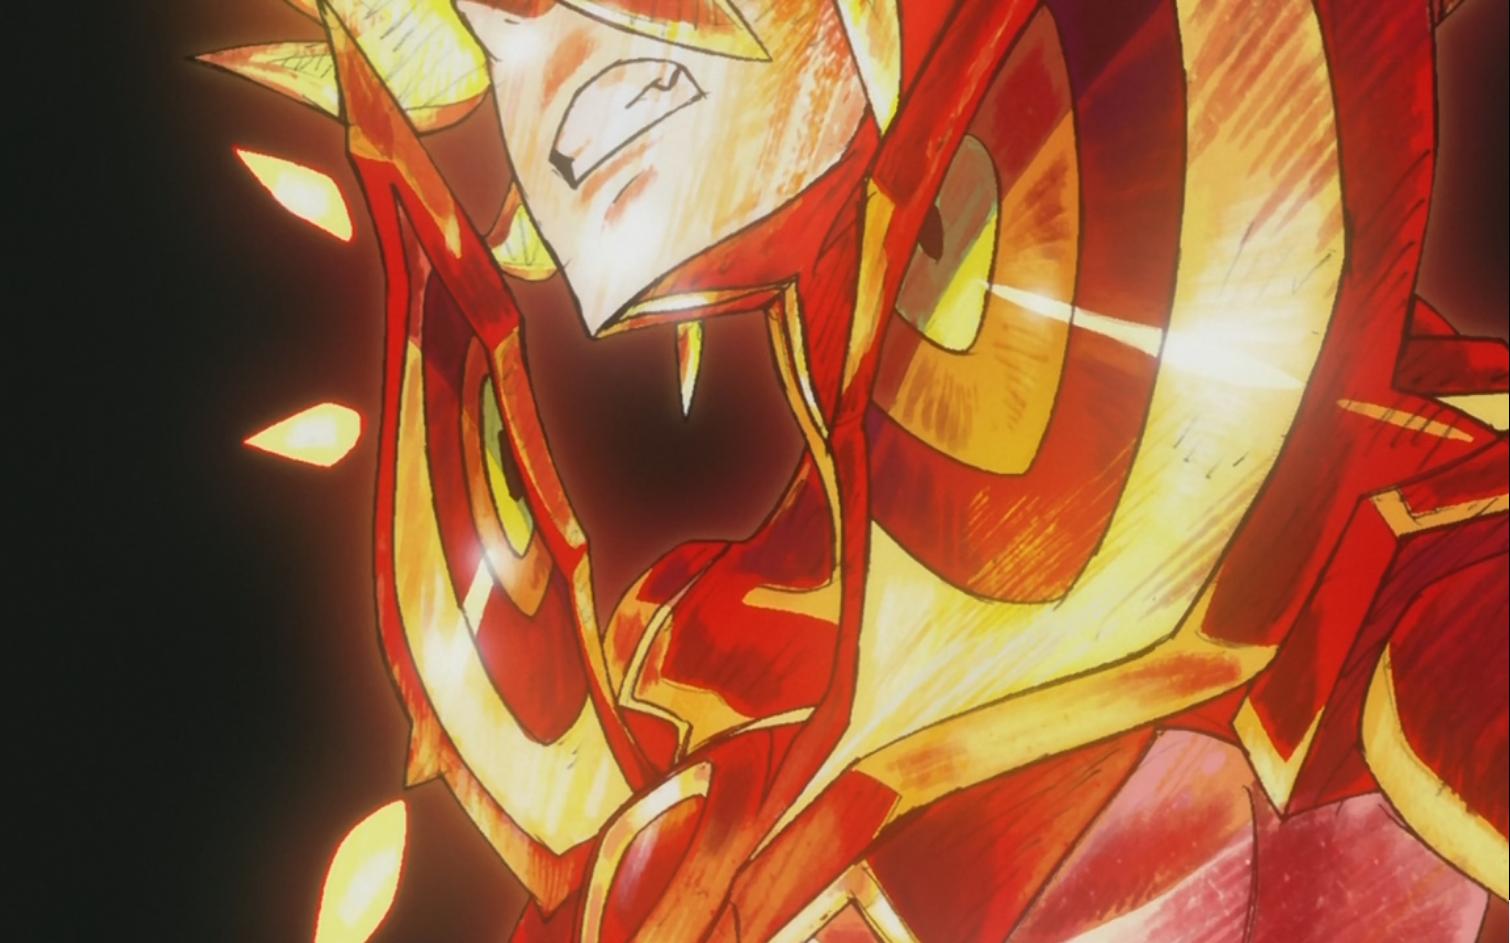 Anime 1510x943 Kill la Kill Matoi Ryuuko face anime